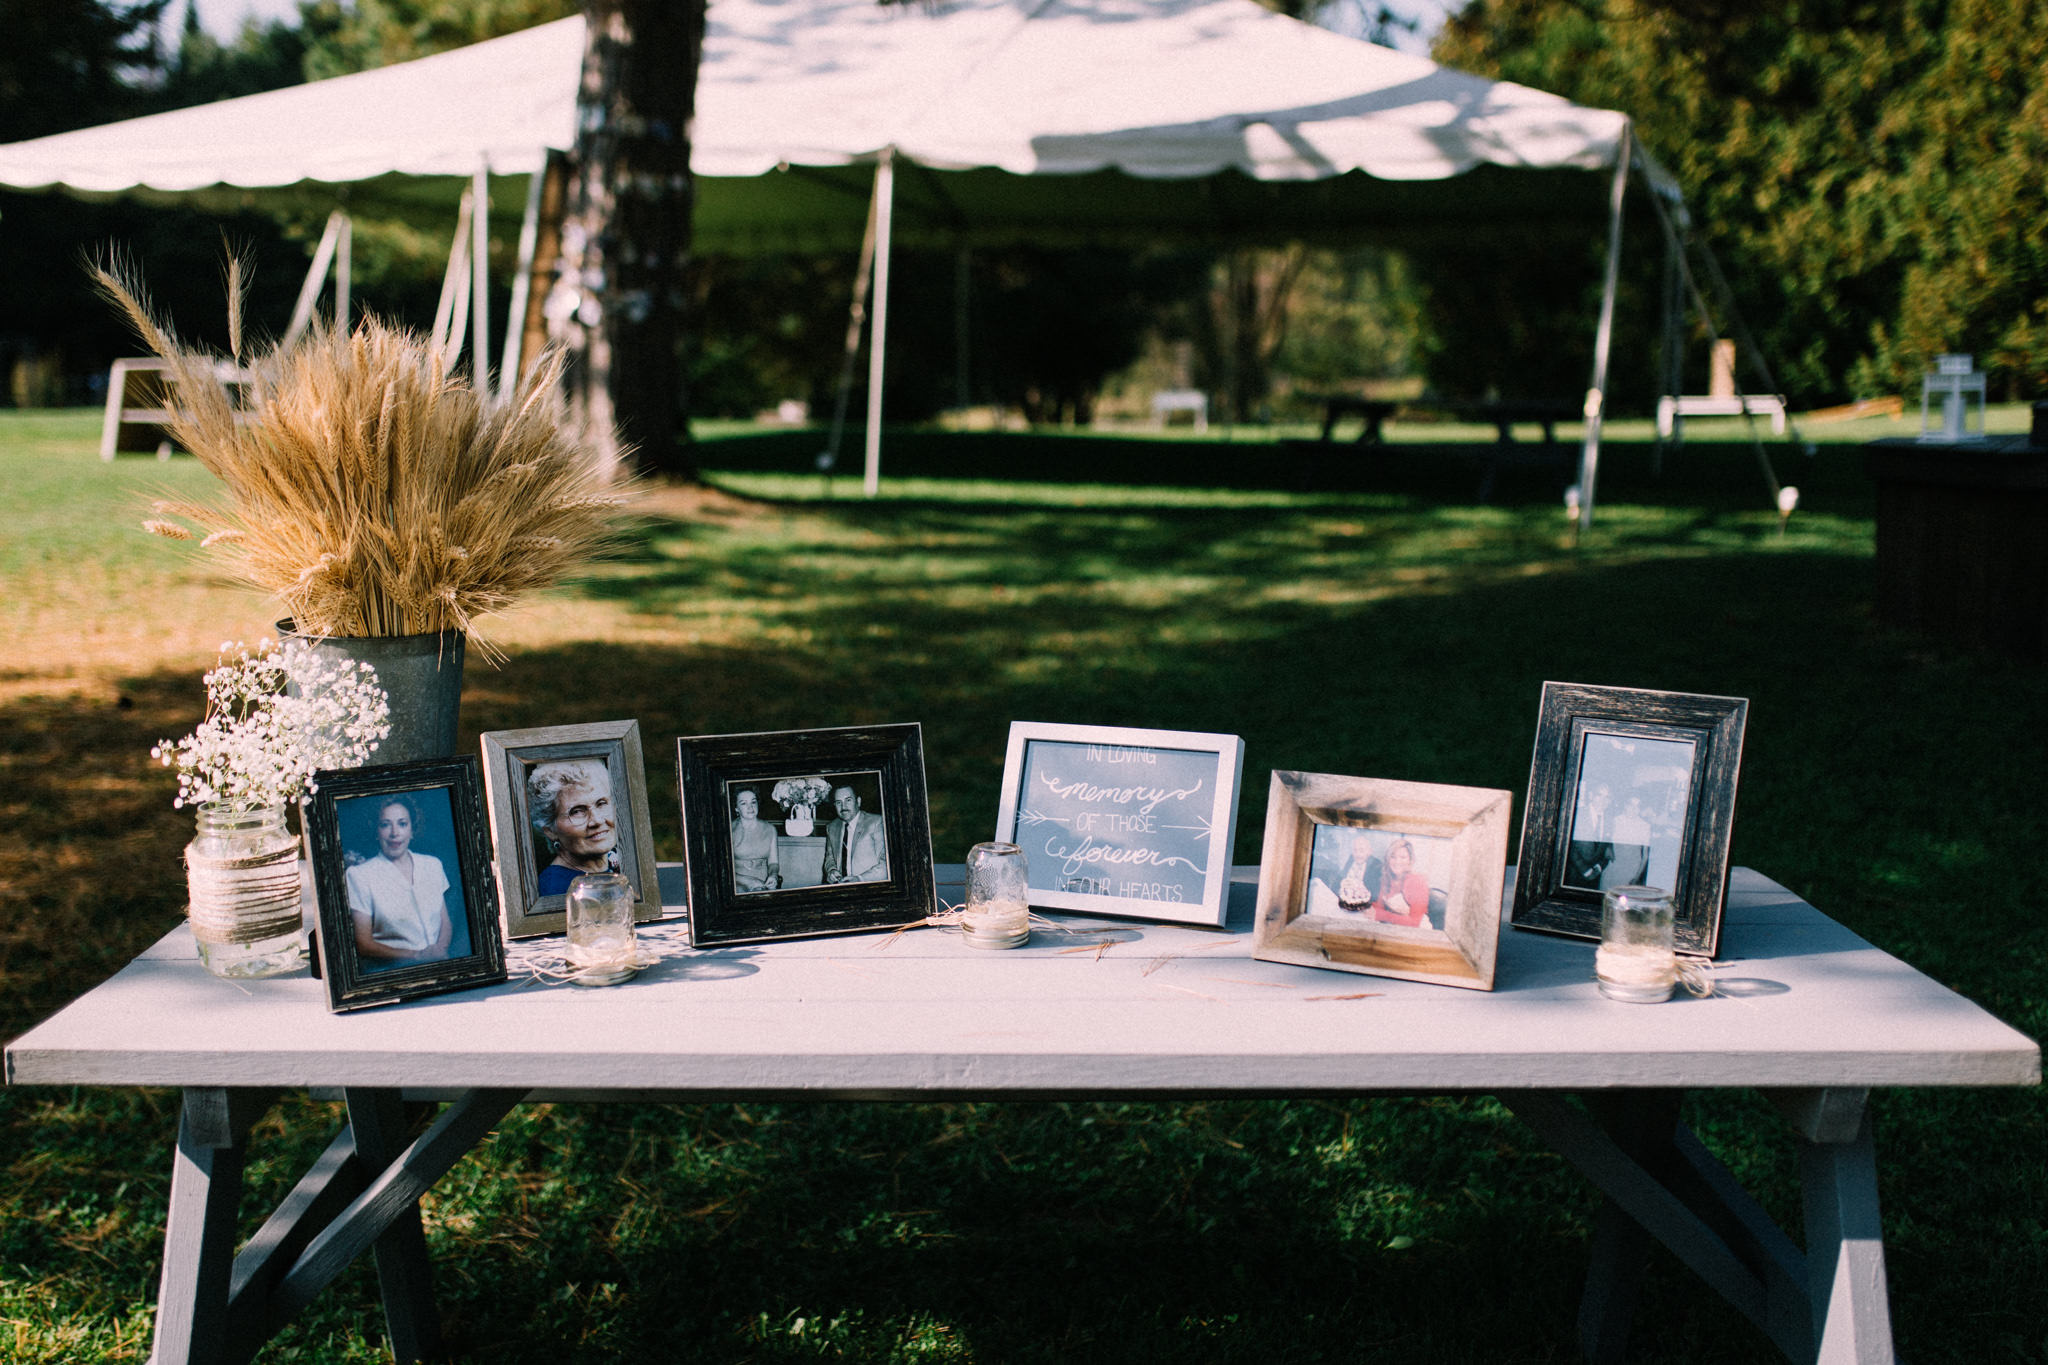 photo frame decor for a wedding